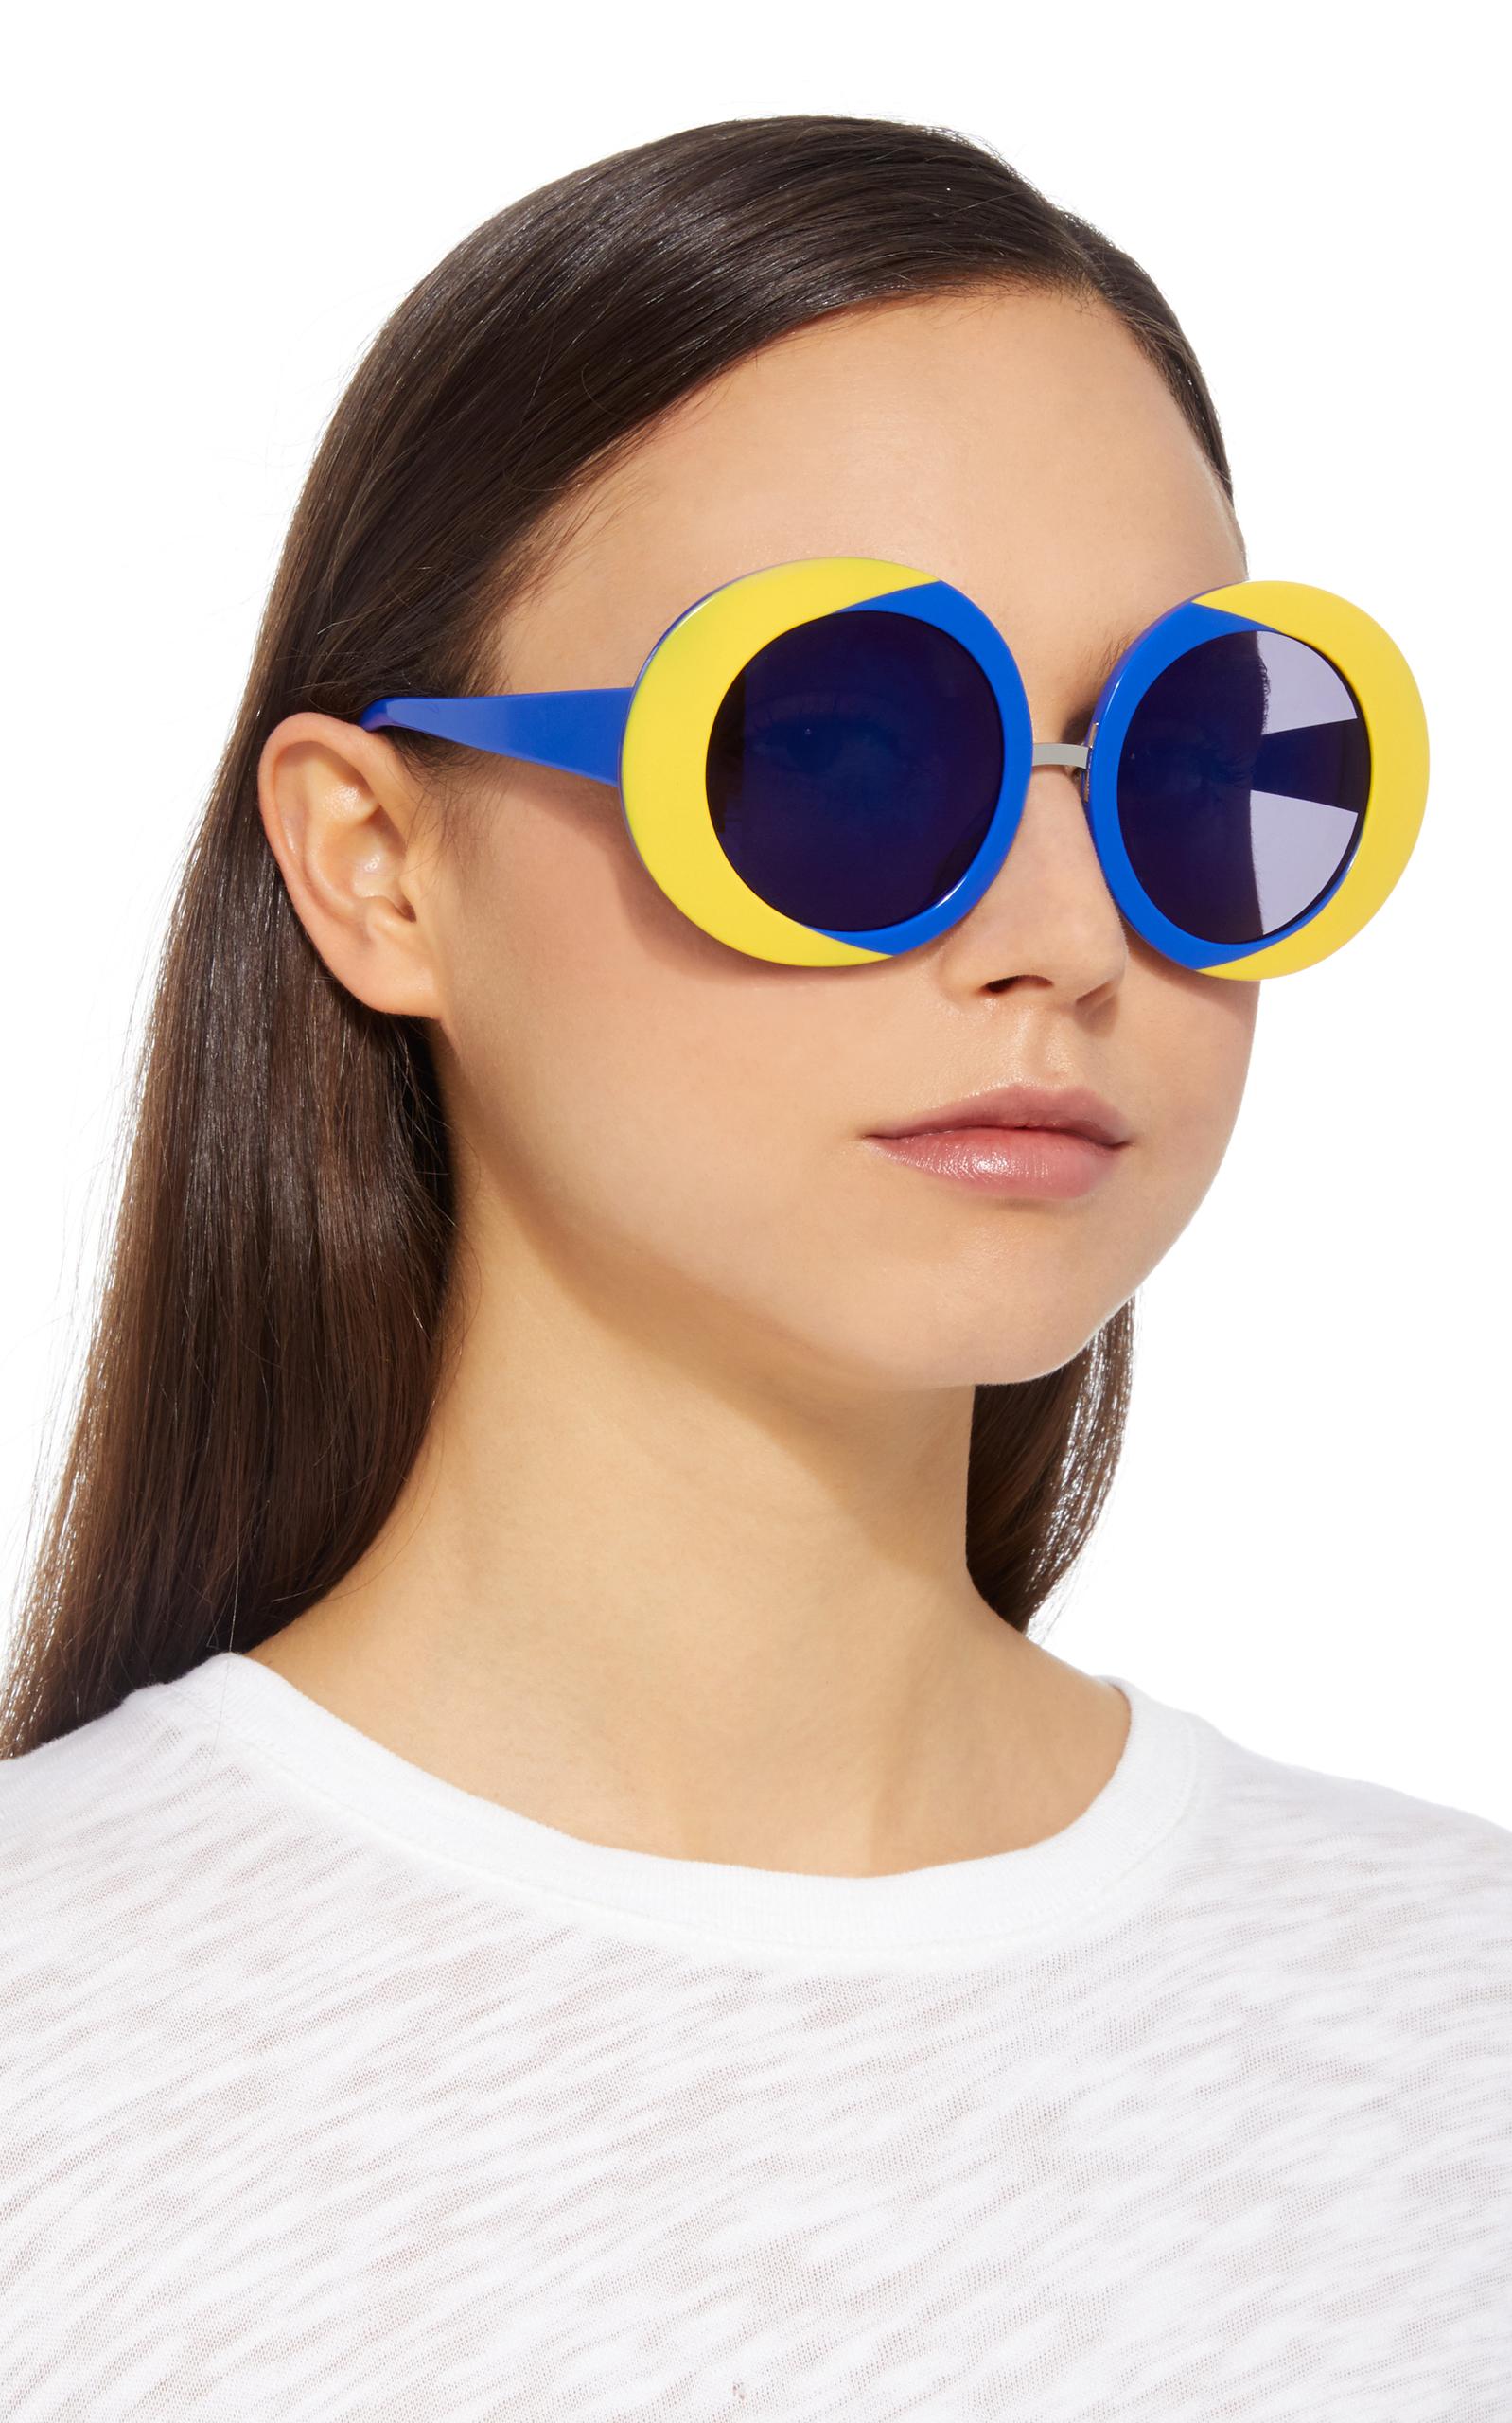 608fe23ac3a Moon Sunglasses by Agatha Ruiz de la Prada